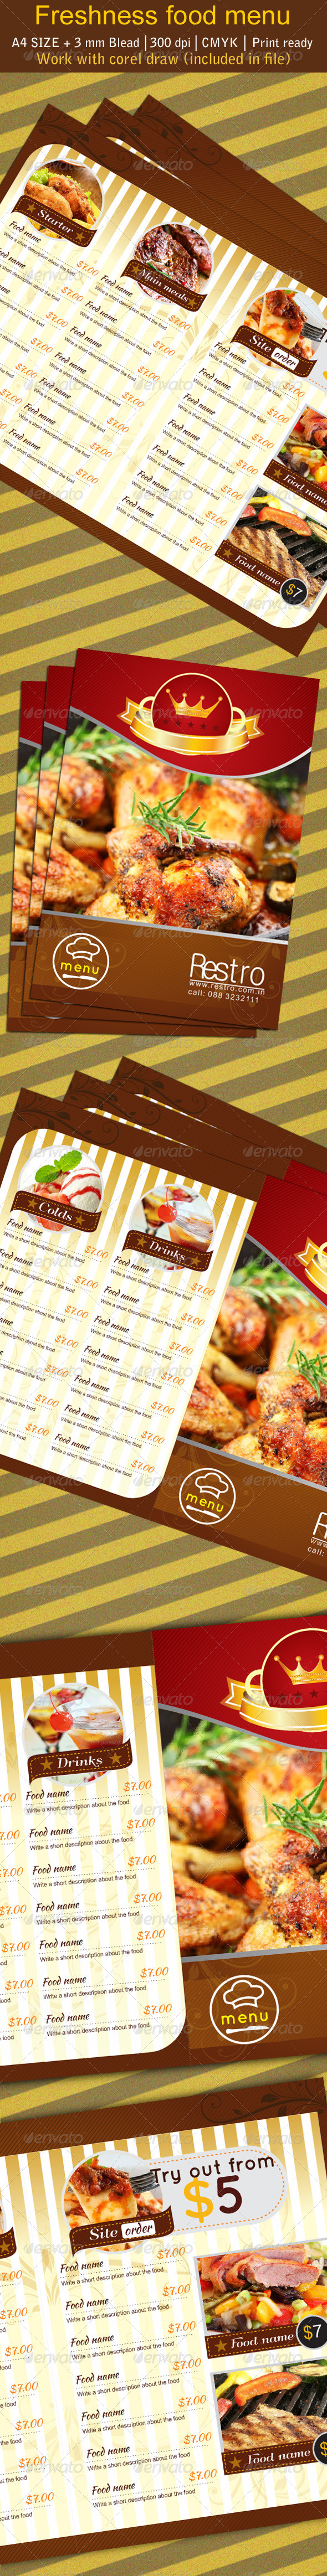 Freshness Restaurant Manu